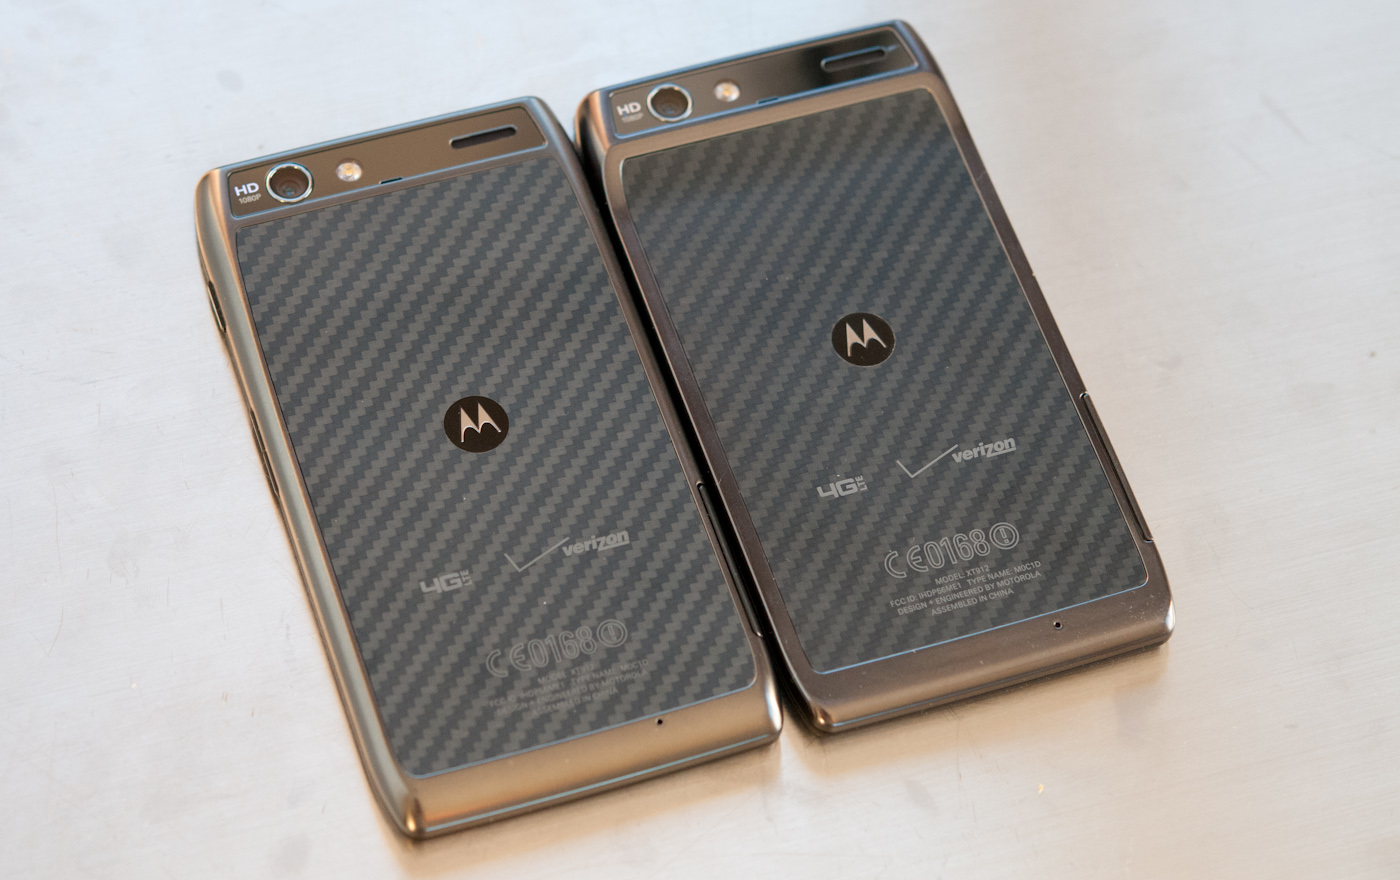 Motorola Droid RAZR MAXX Review - 1.8x The Battery